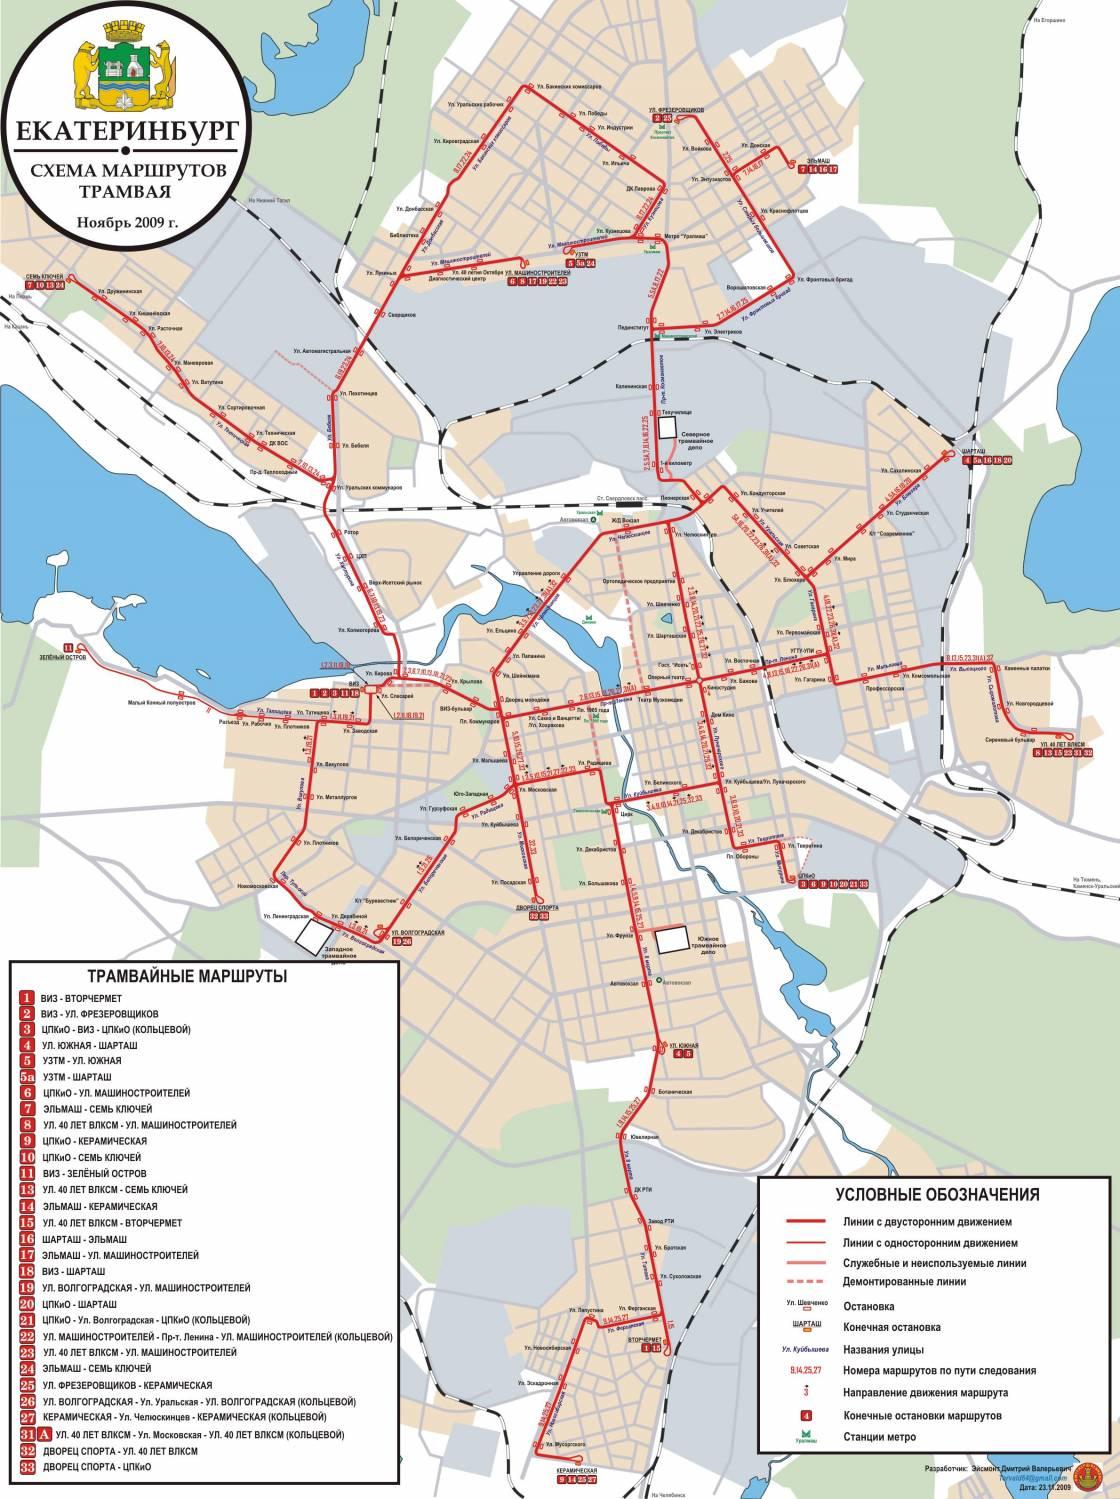 Схема маршрутов трамвая екатеринбурга